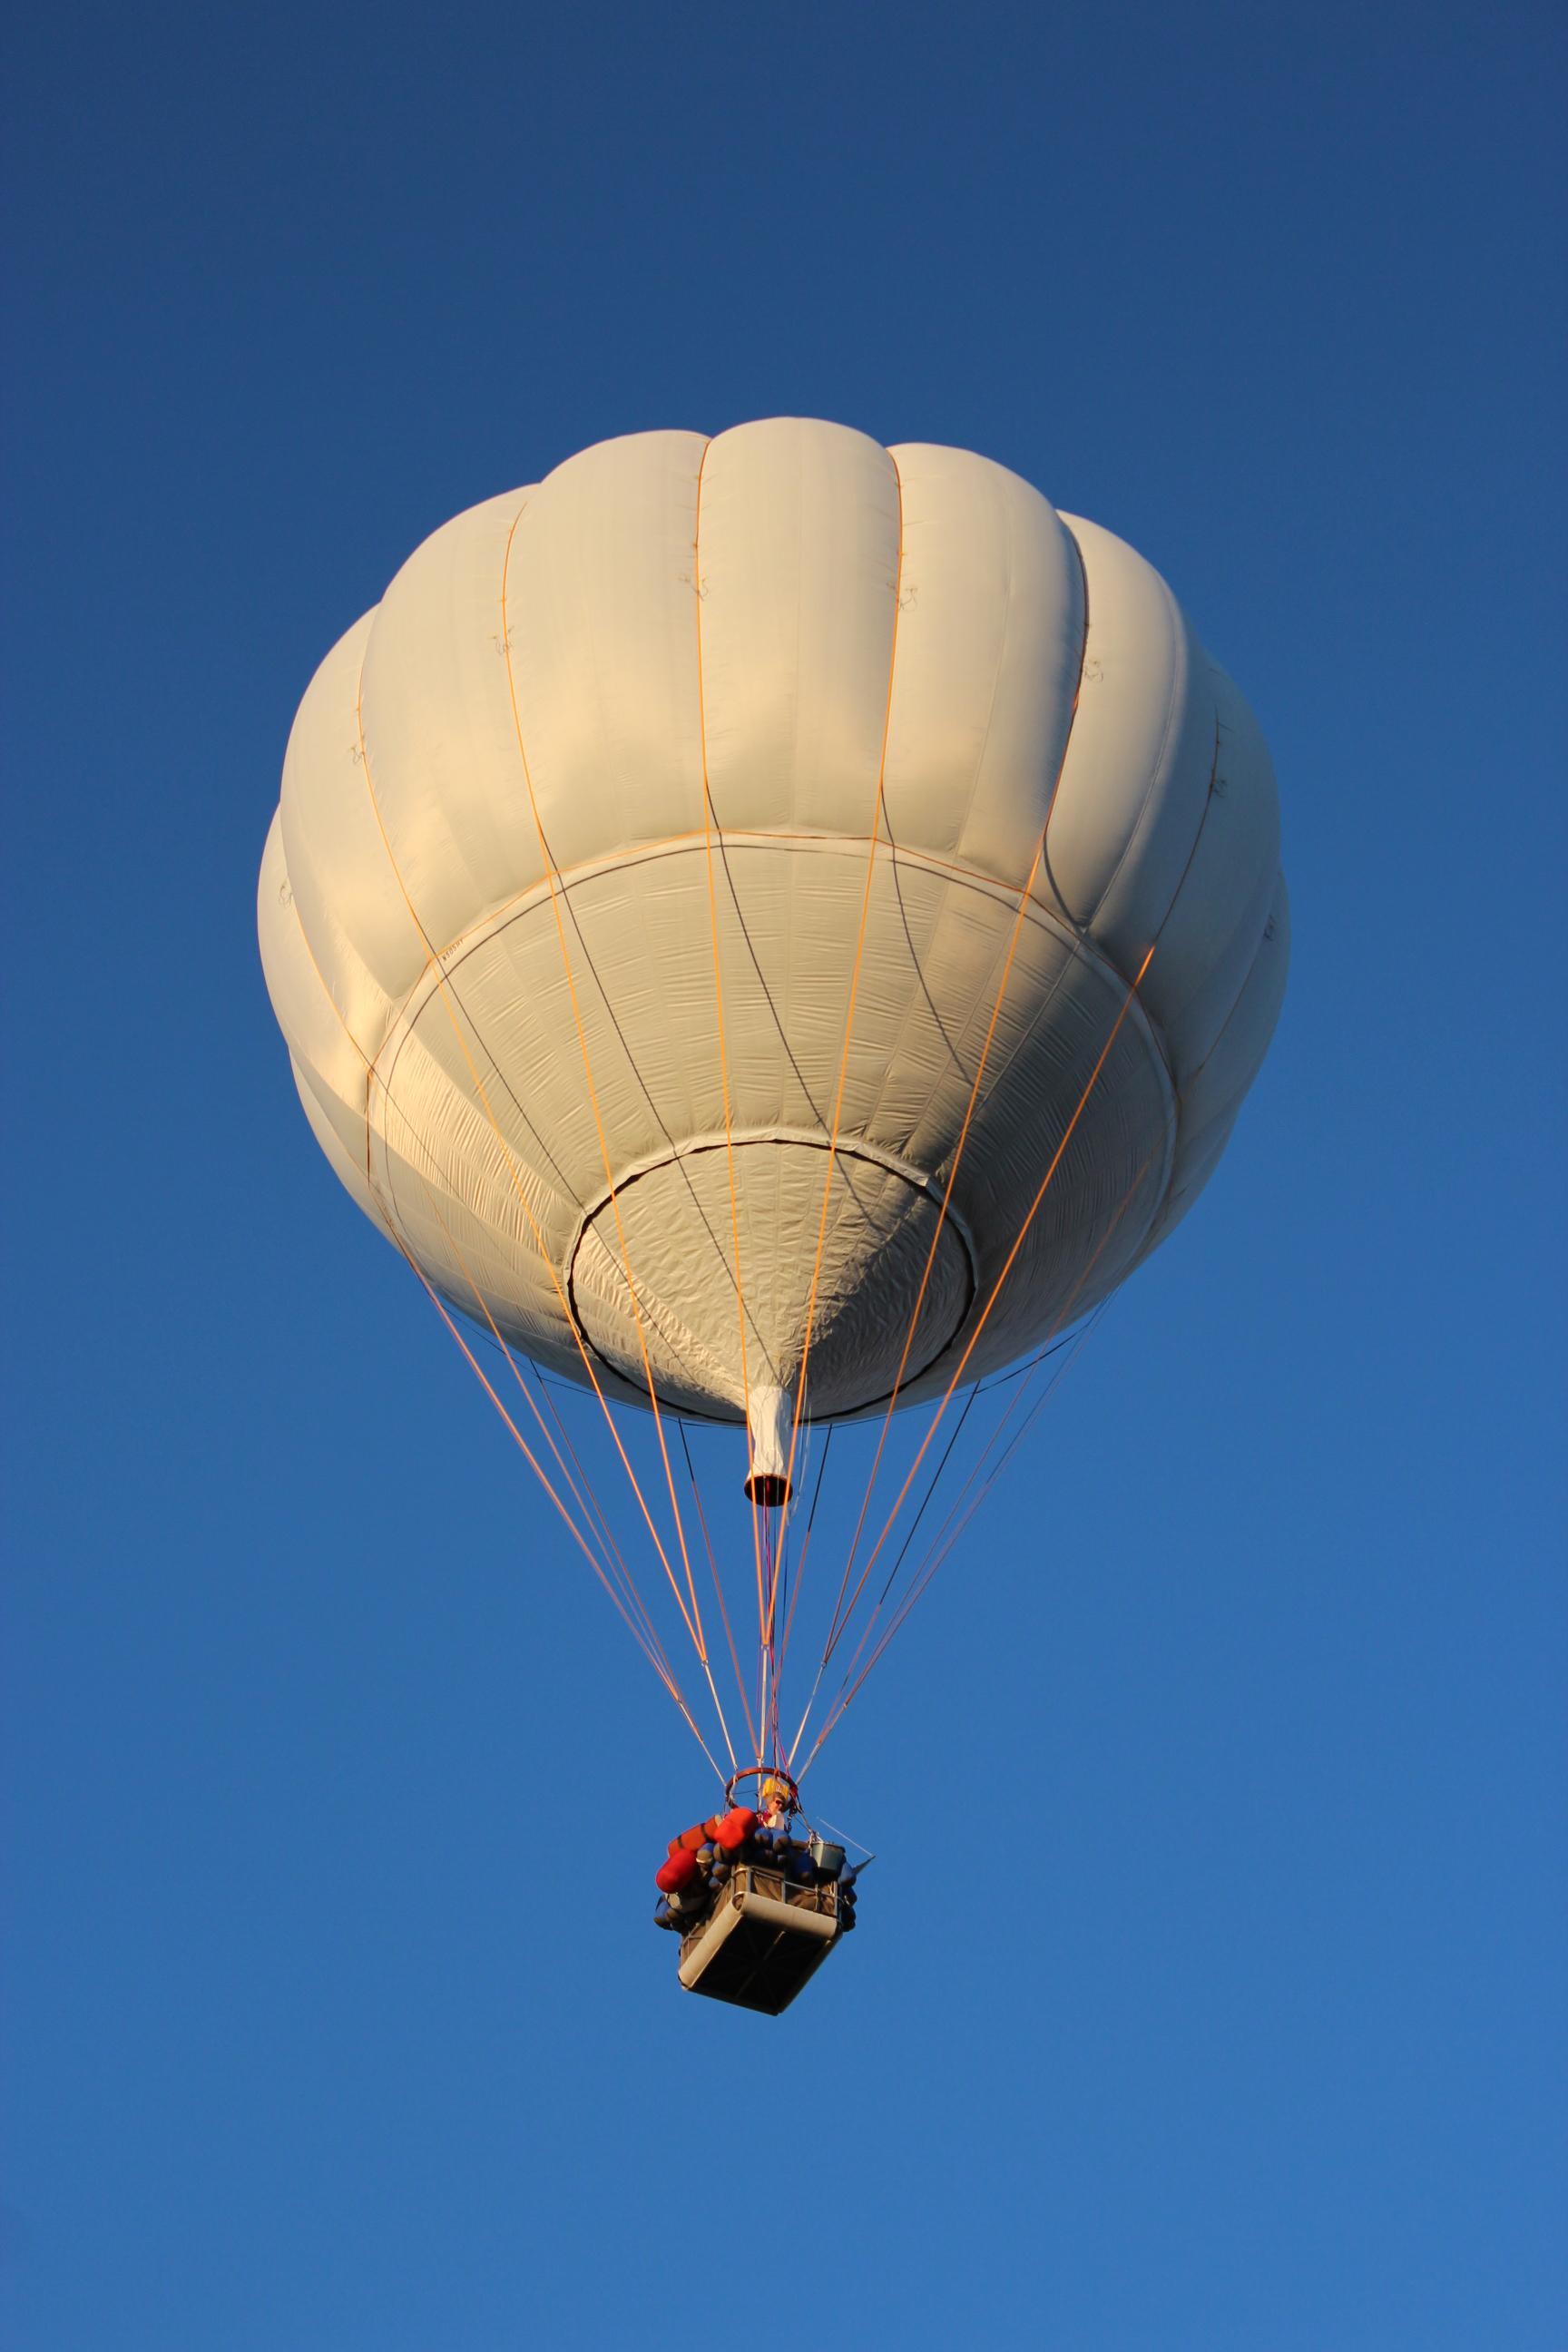 Foxtrot Charlie Gas Balloon